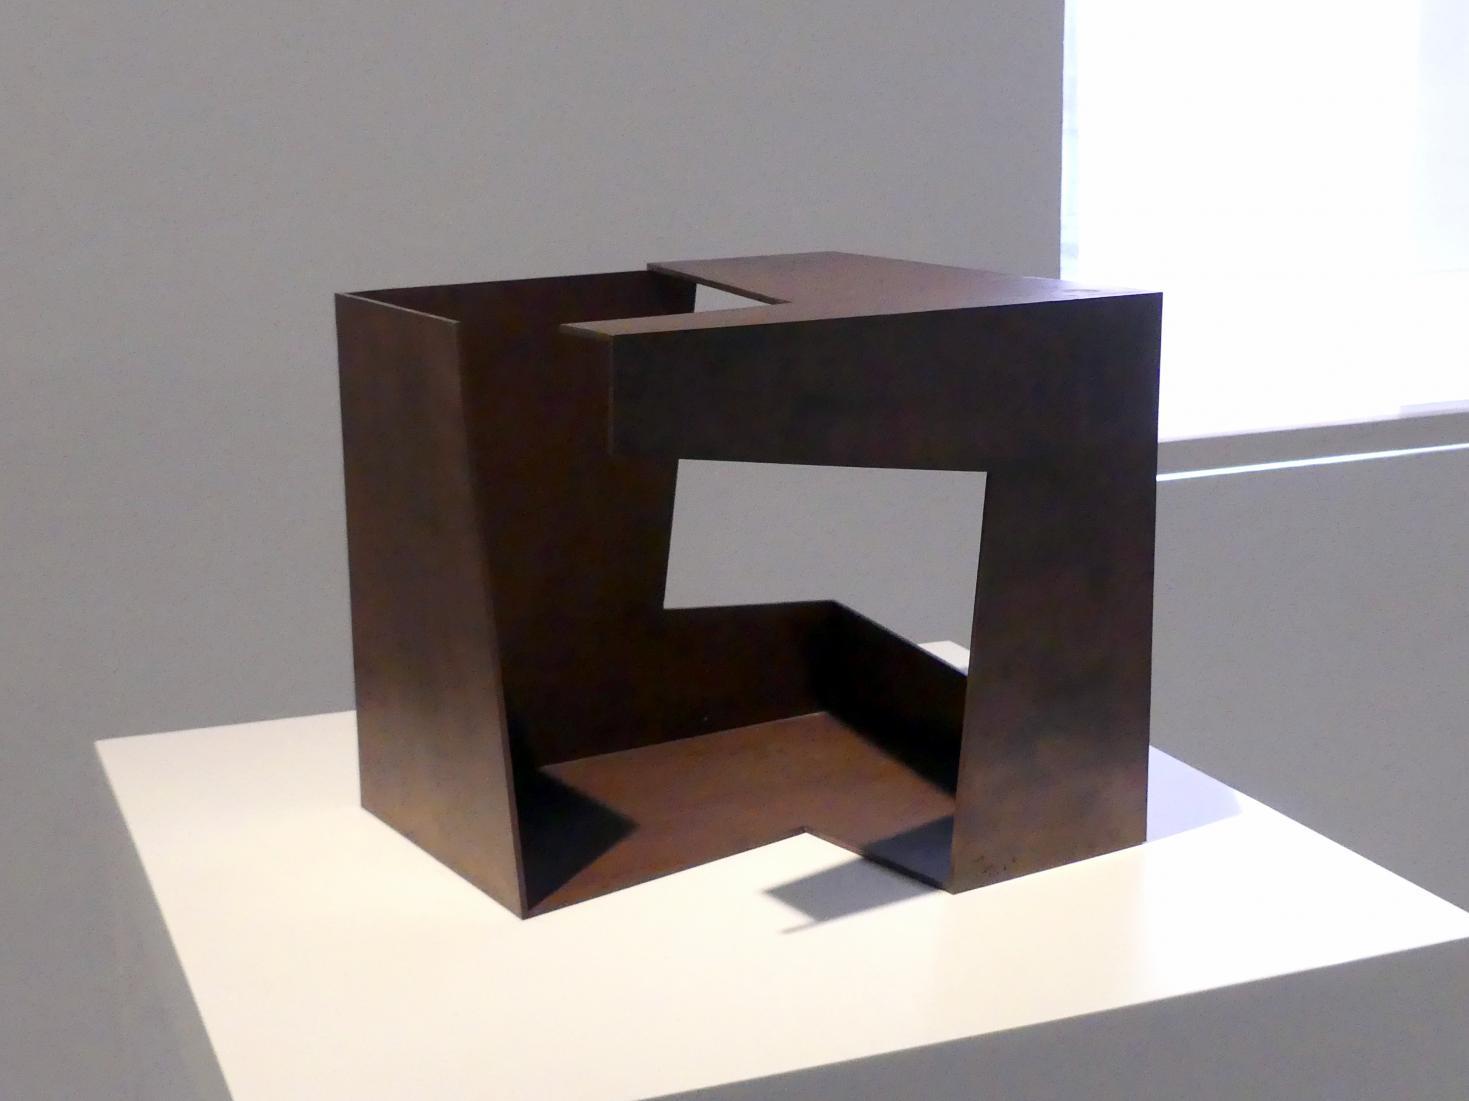 Jorge Oteiza: Leere Box, 1958